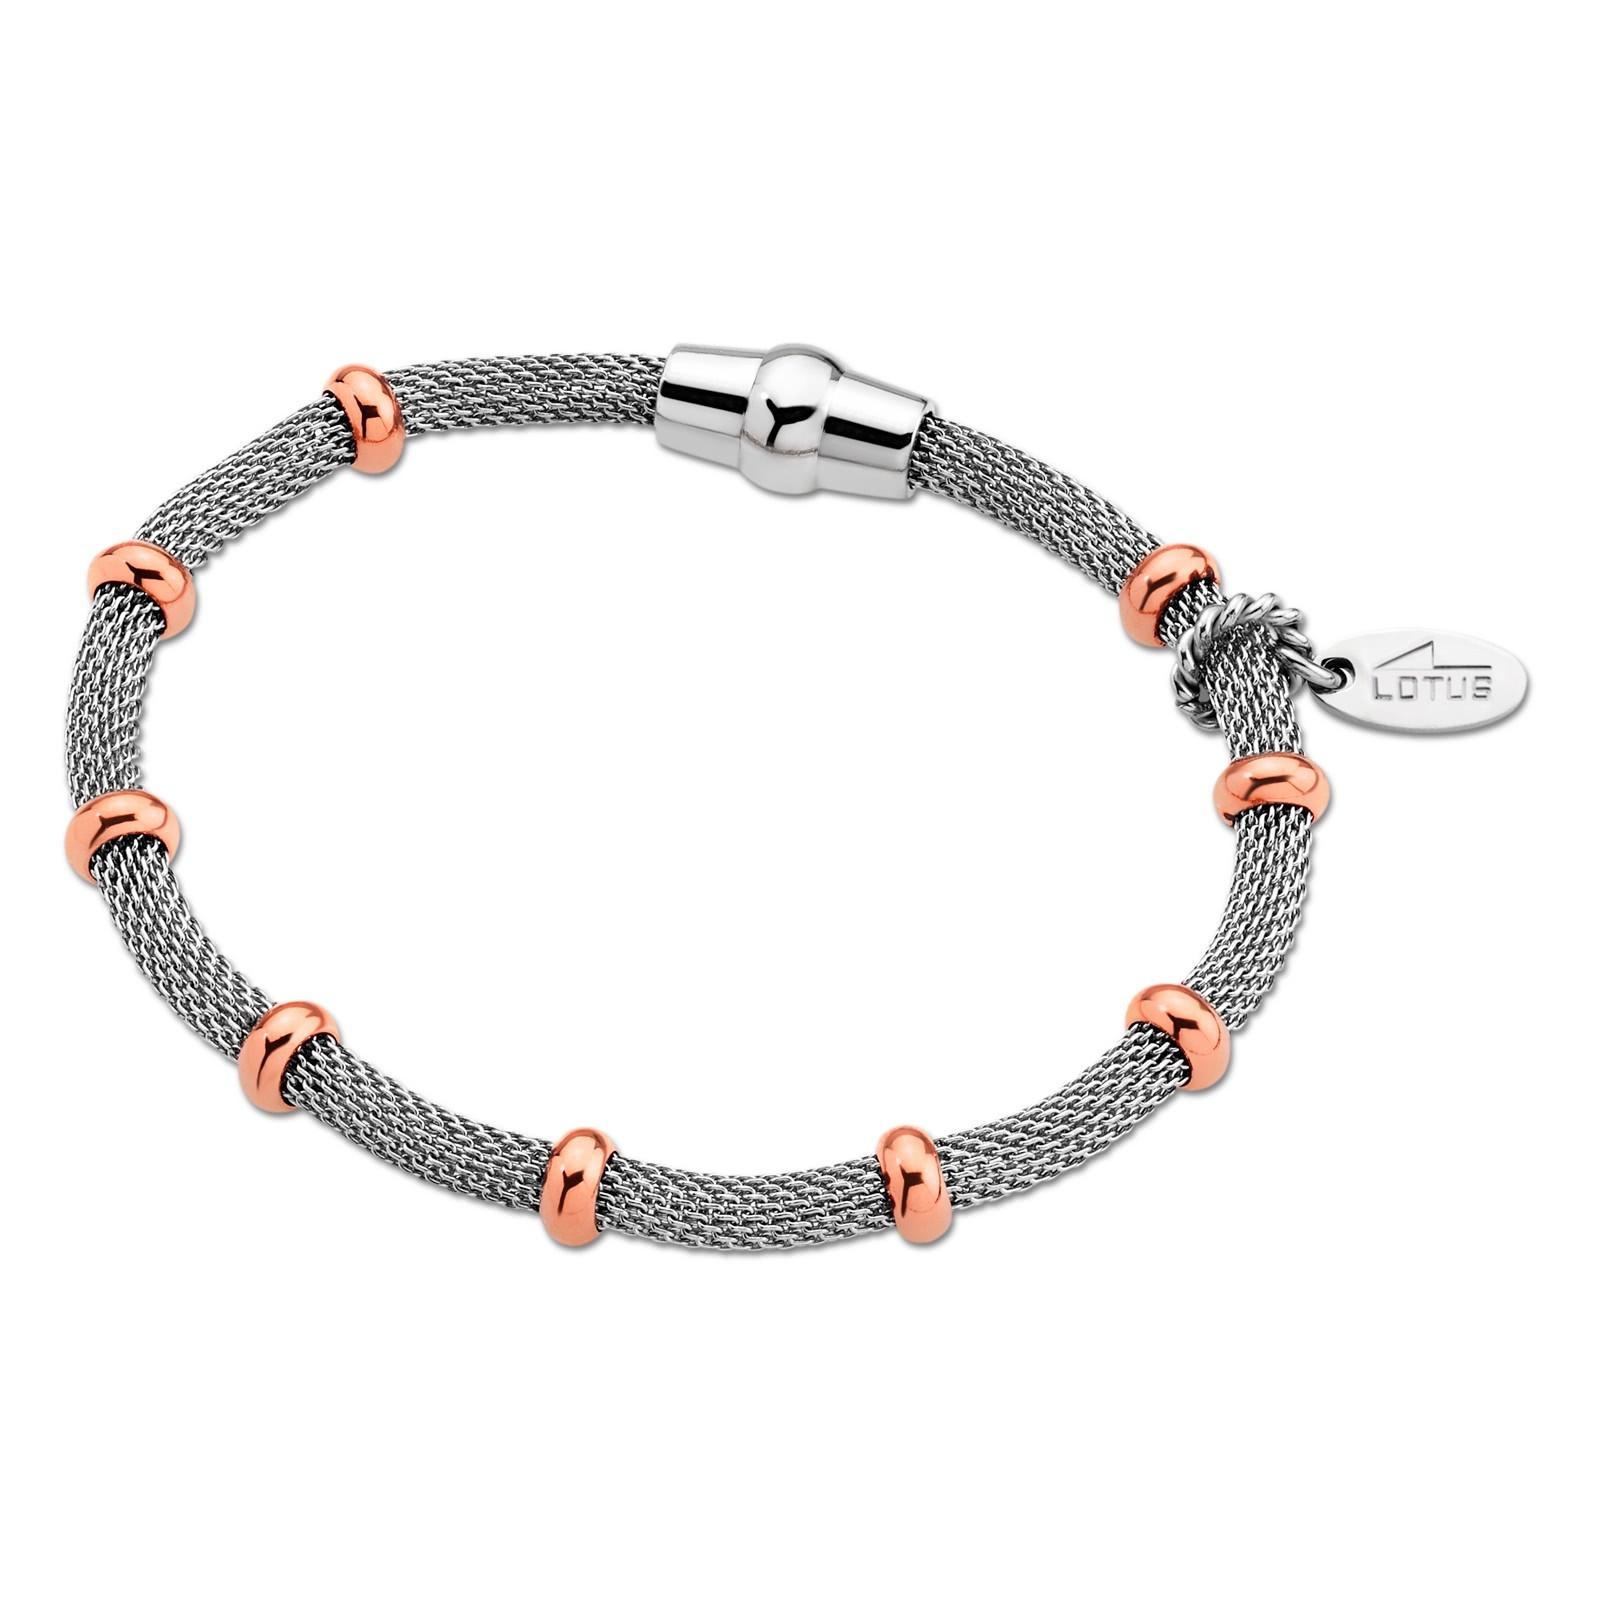 LOTUS Style Damen Armband Trendy-Kollektion Edelstahl JLS1680-2-3